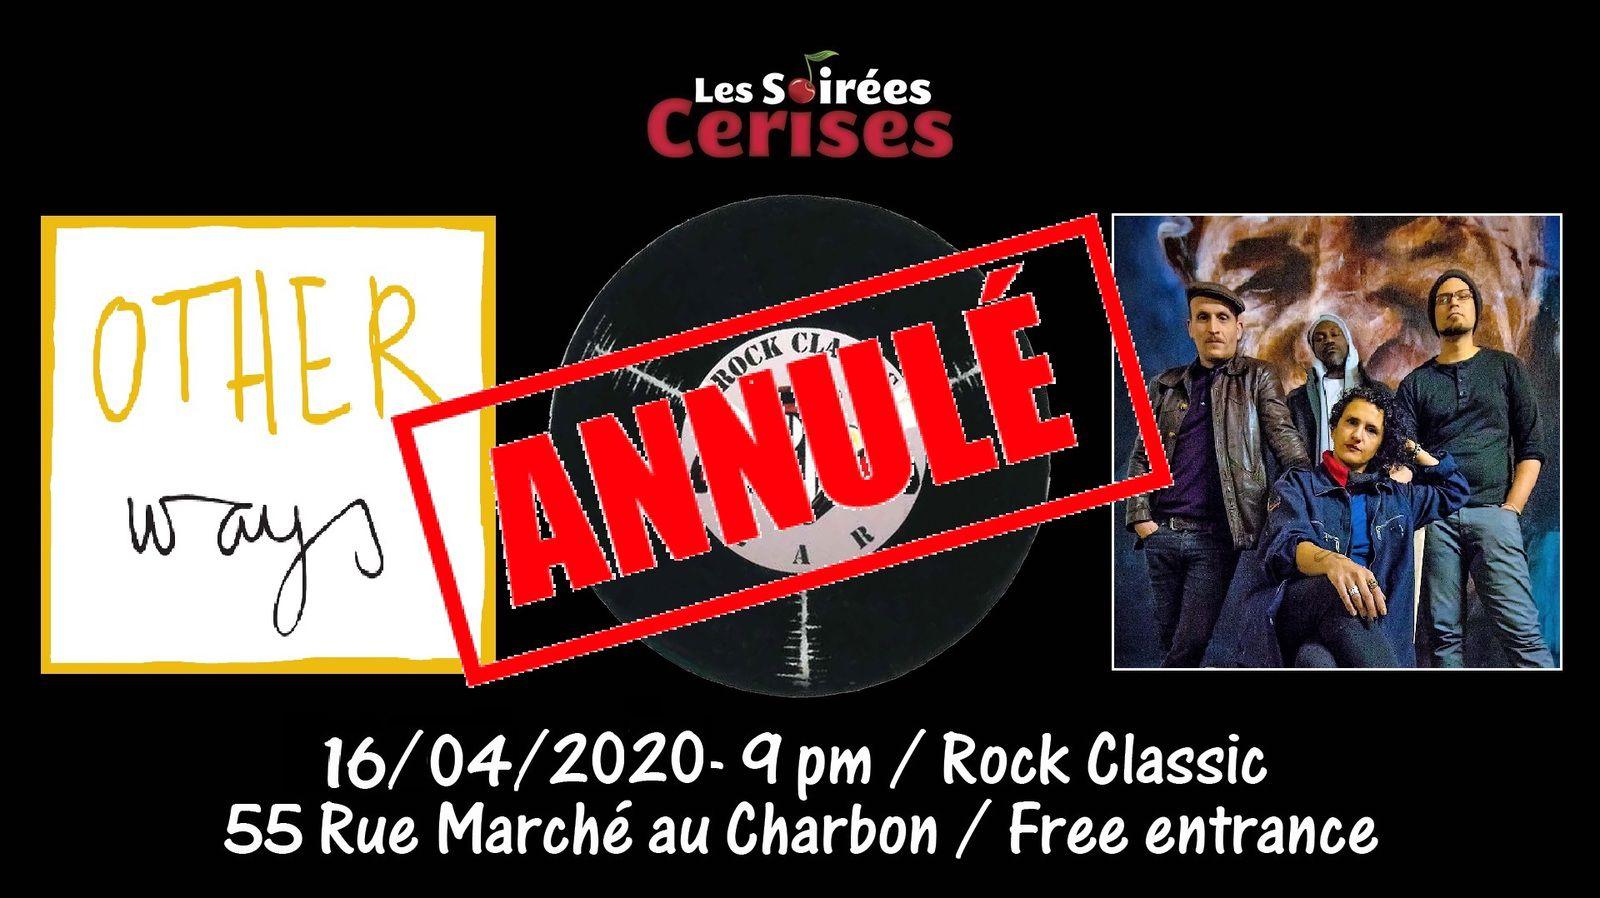 🎵 Other ways @ Rock Classic - 16/04/2020 - annulé